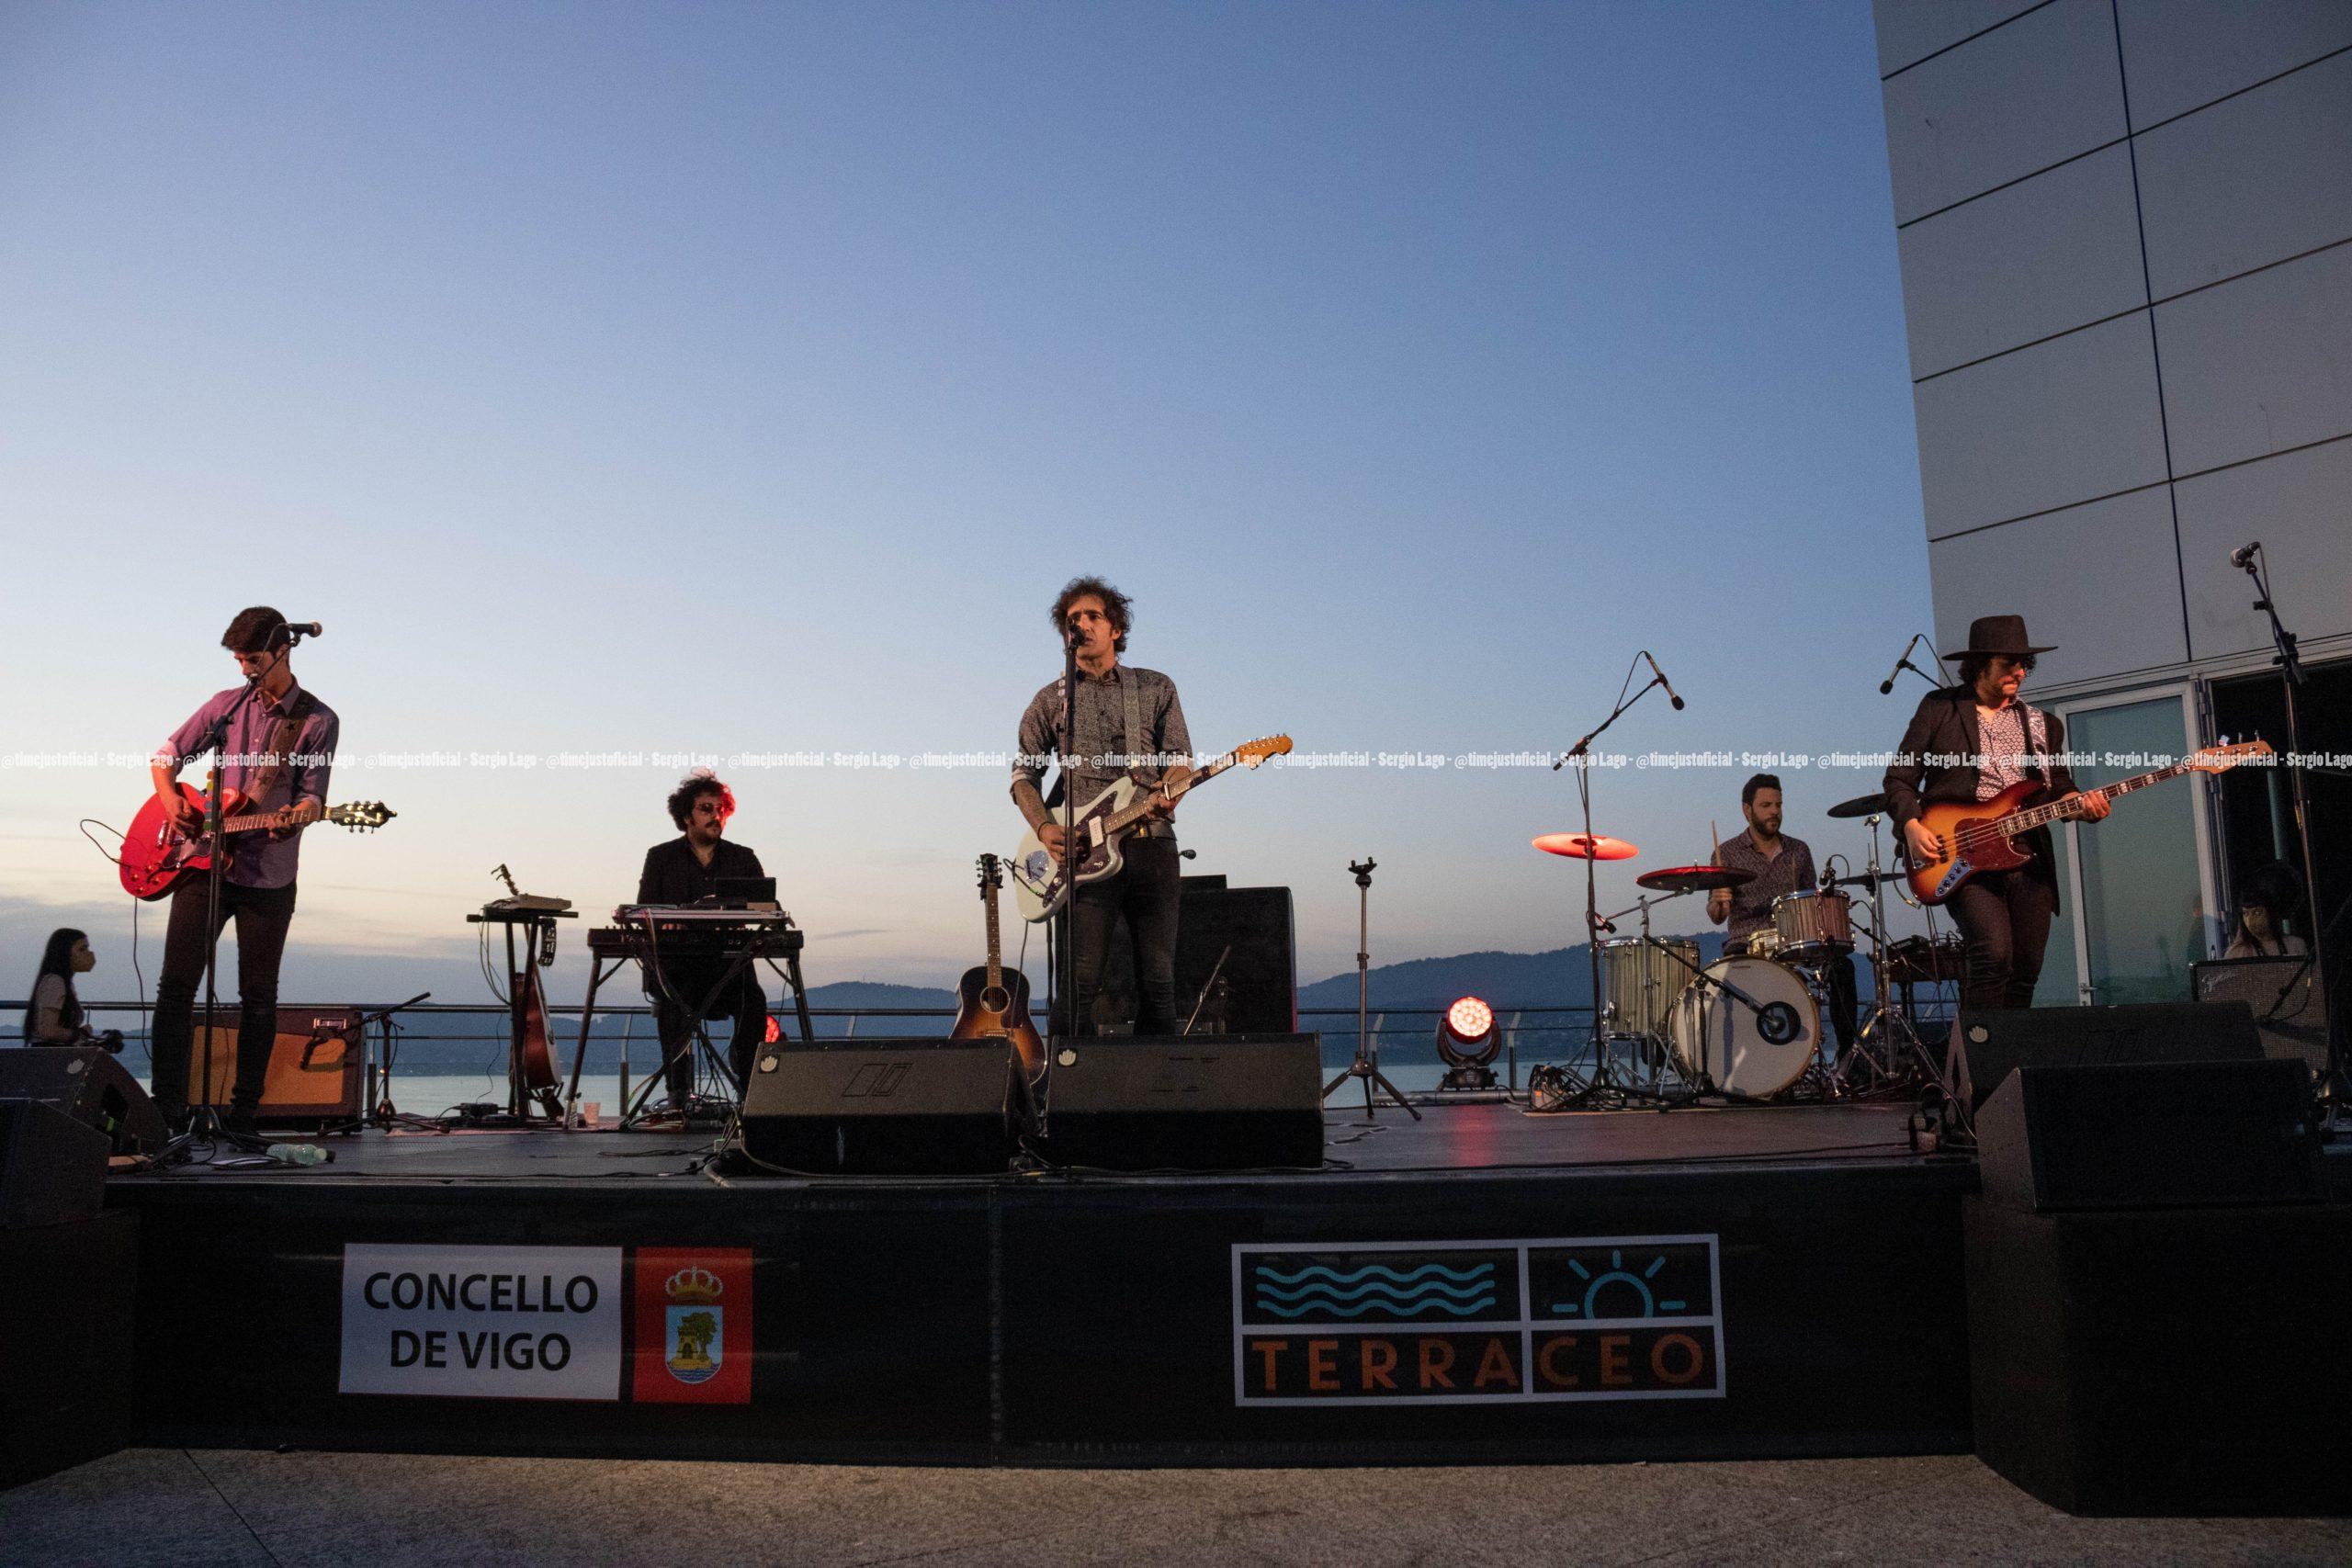 concierto maldito murphy festival terraceo vigo (2)